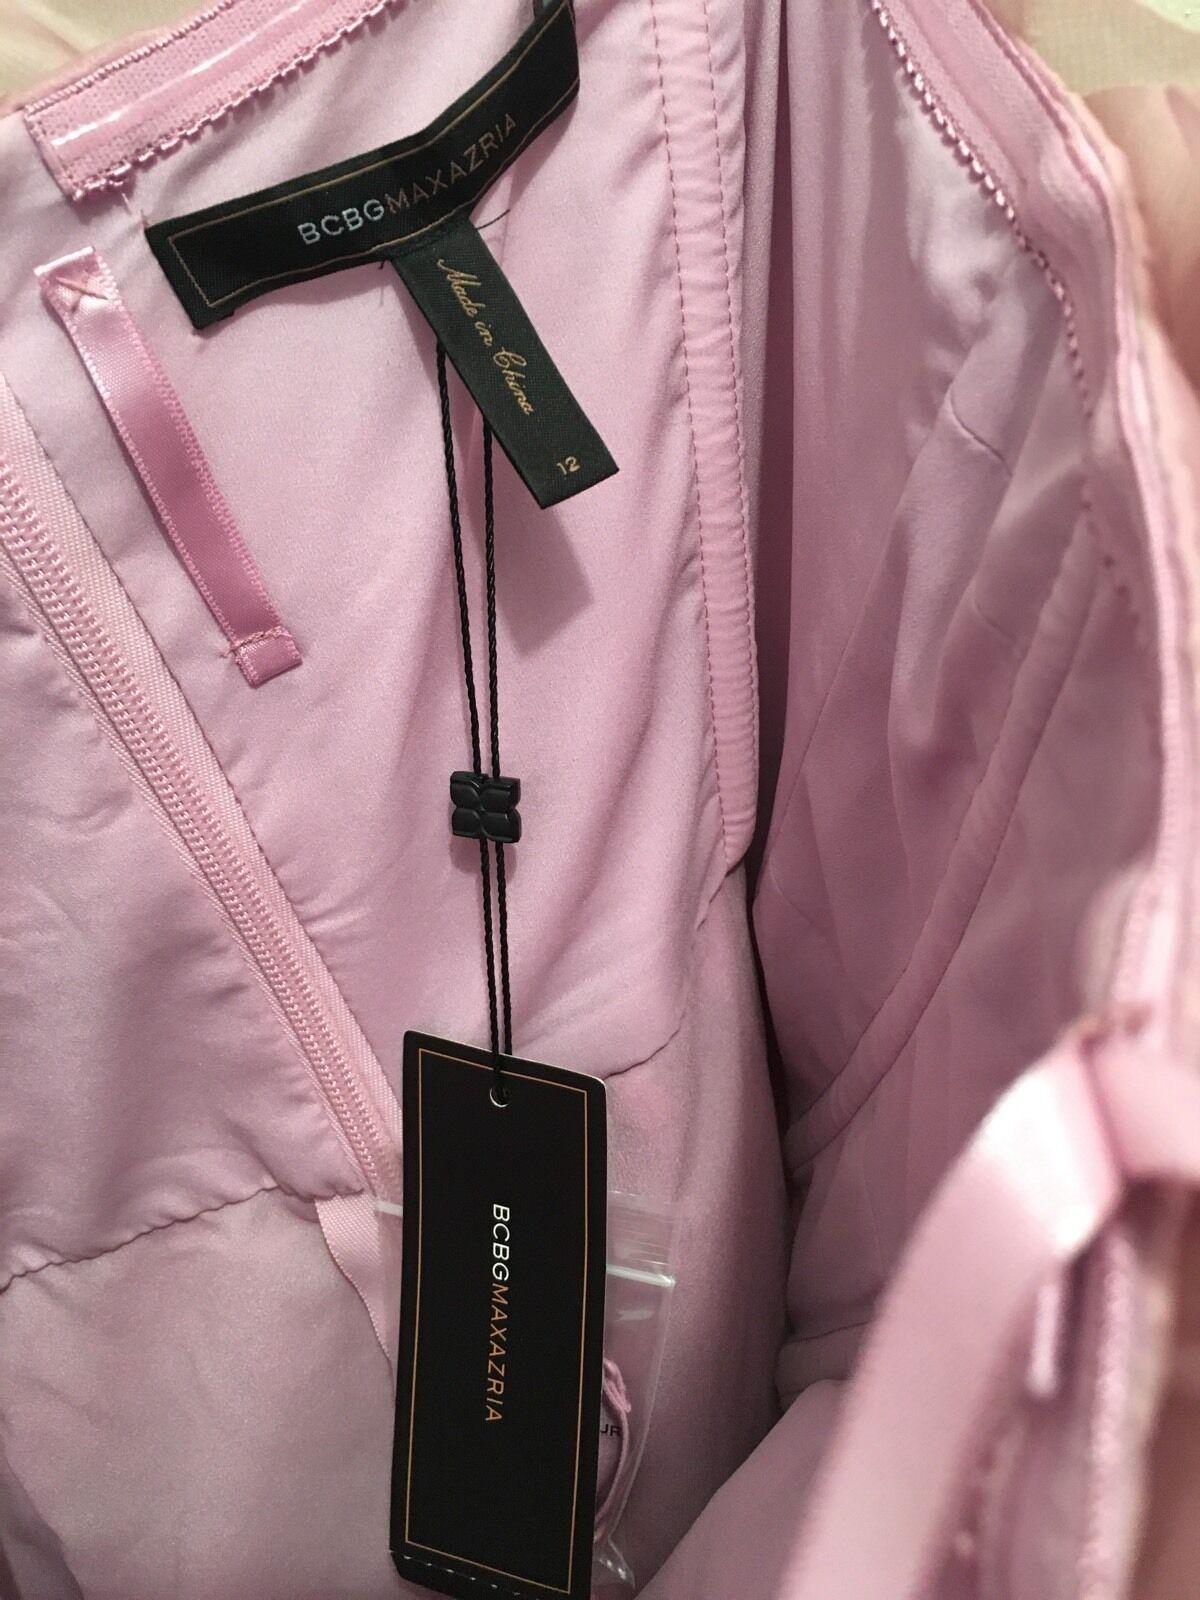 BCBG MAXAZRIA MIGNON STRAPLESS RUFFLE DRESS - Size 12 12 12 RTL  398  885020